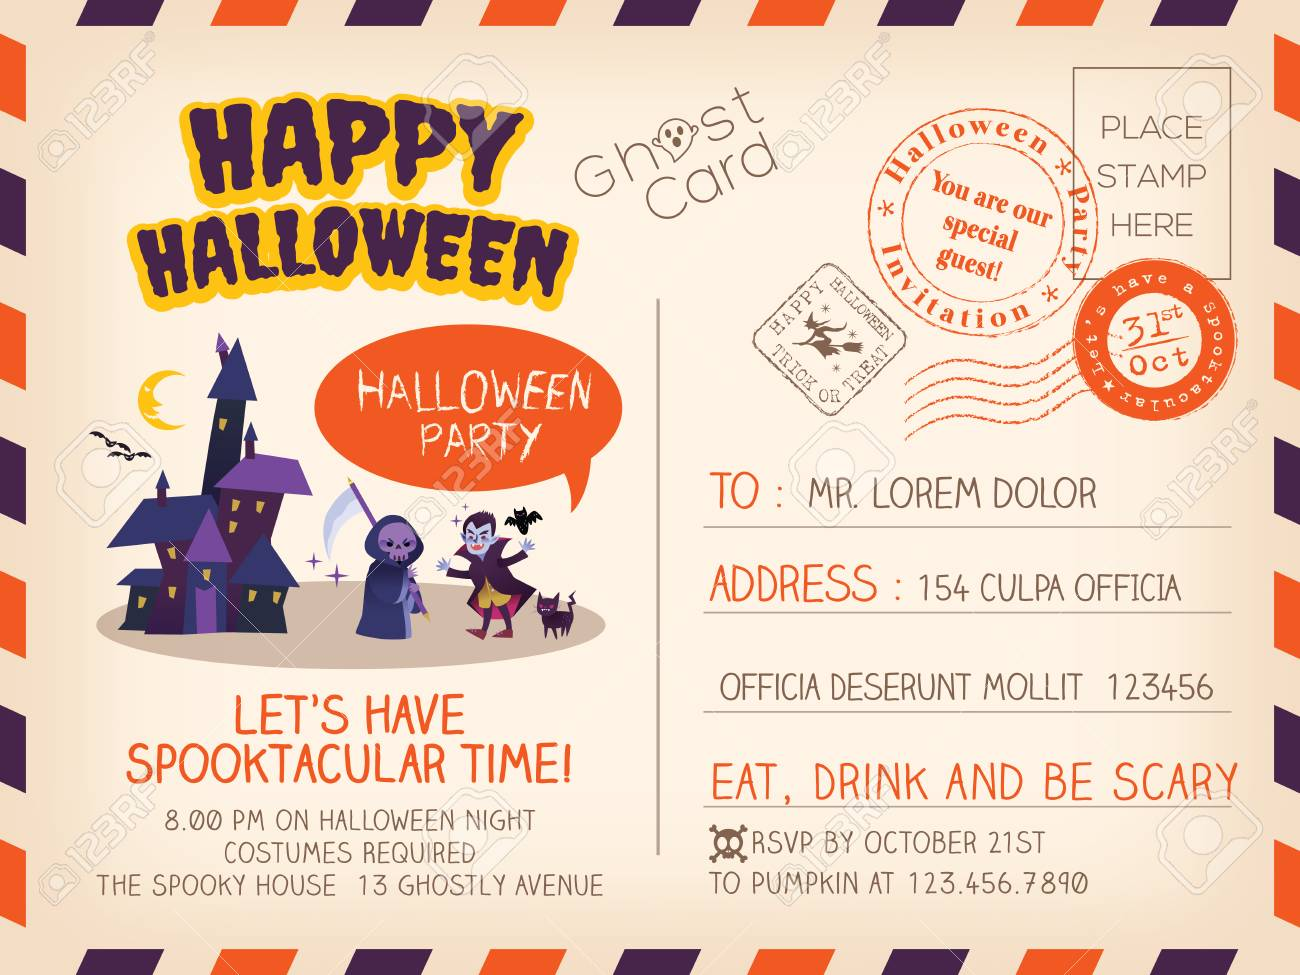 Happy Halloween Party Vintage Postcard Invitation Background ...